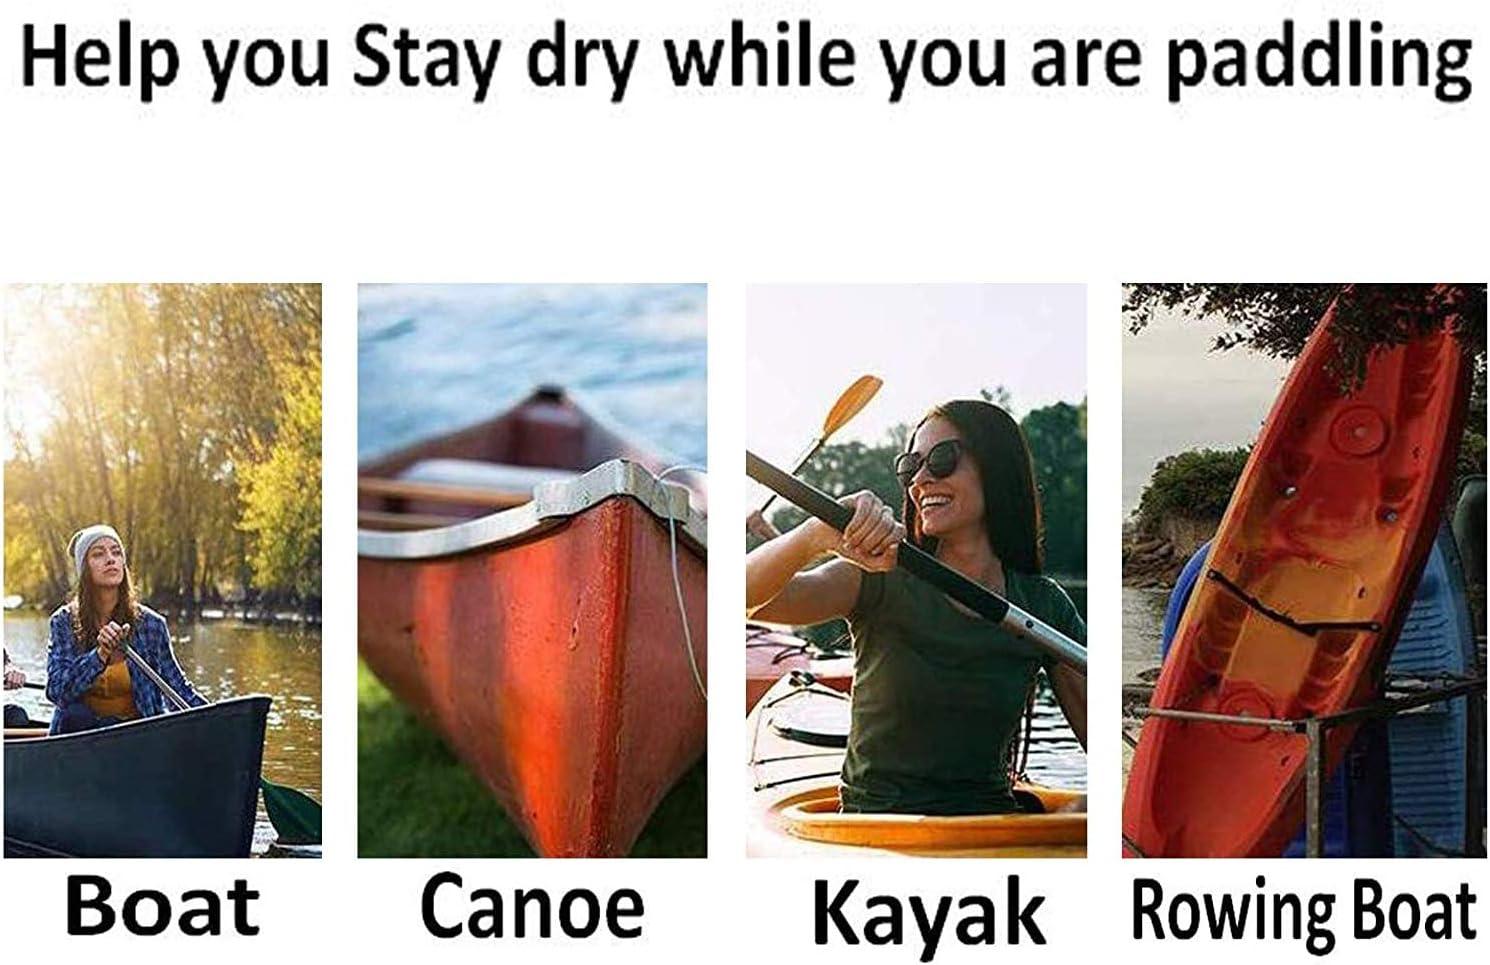 Black Medoore 4 Pack Universal Kayak Scupper Plugs Canoe Boat Scupper Stopper Plugs Bungs Replacement for Kayak Canoe Boat Drain Holes